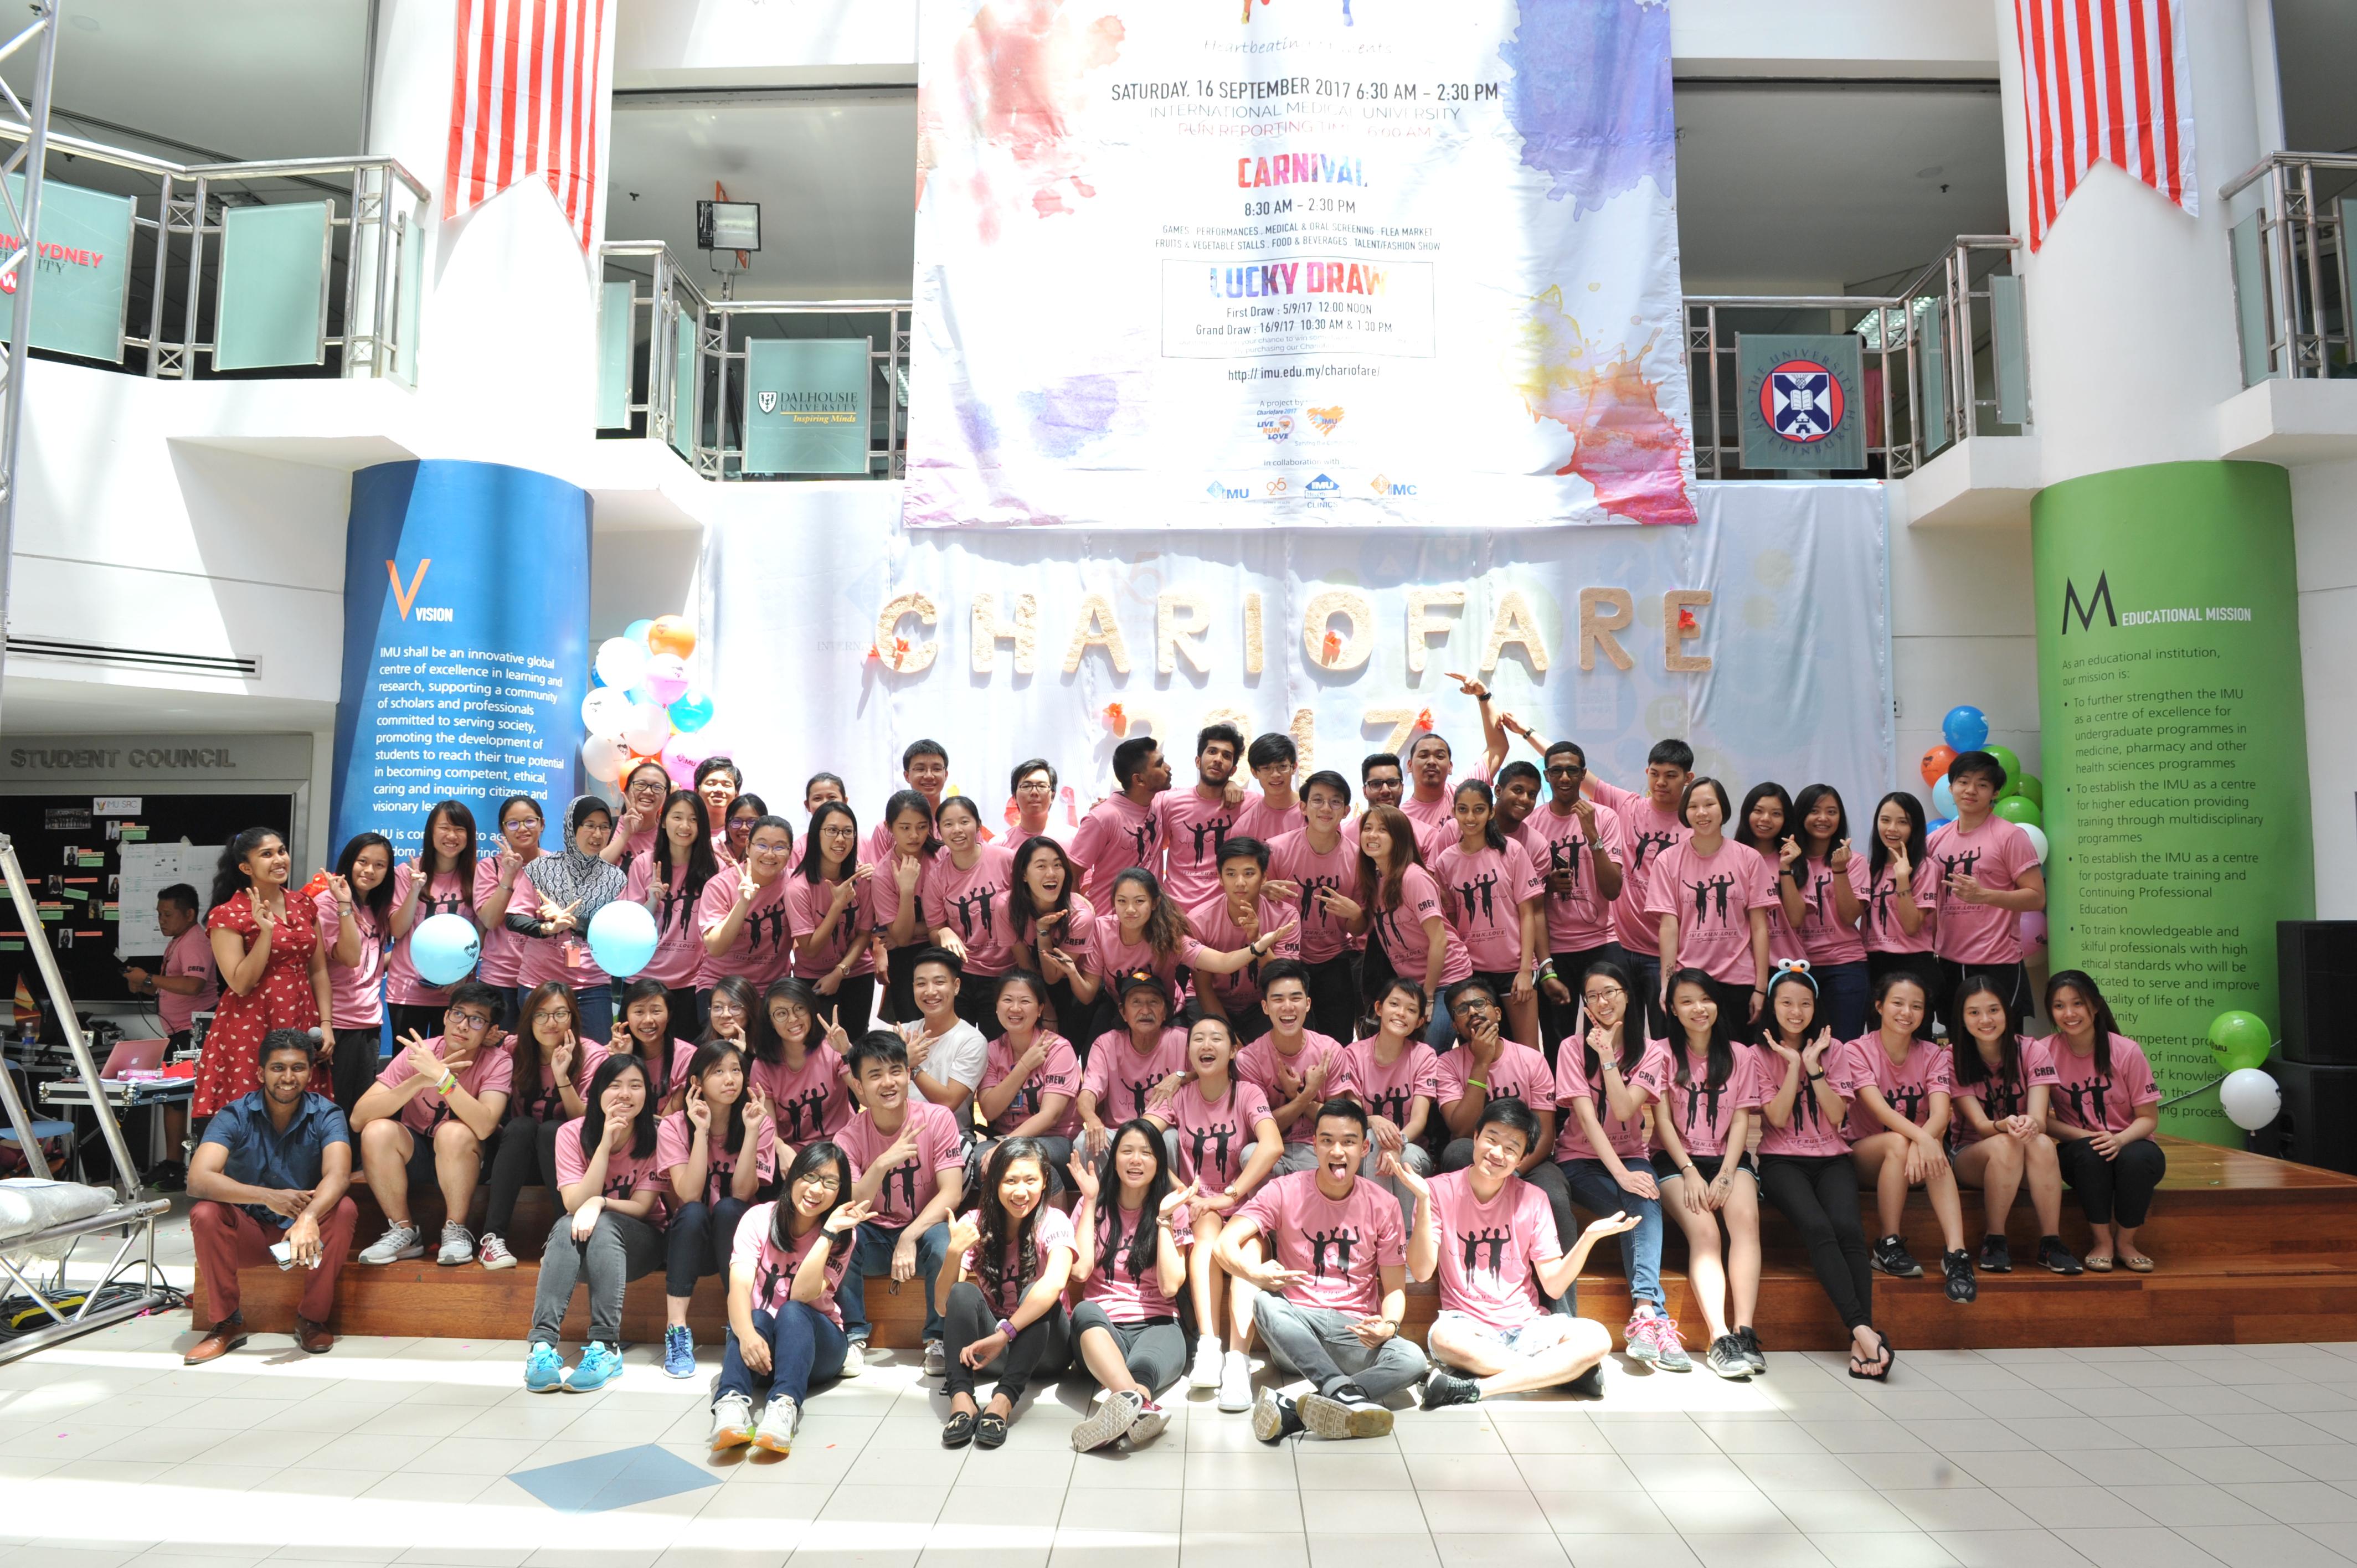 Chariofare 2017 Group